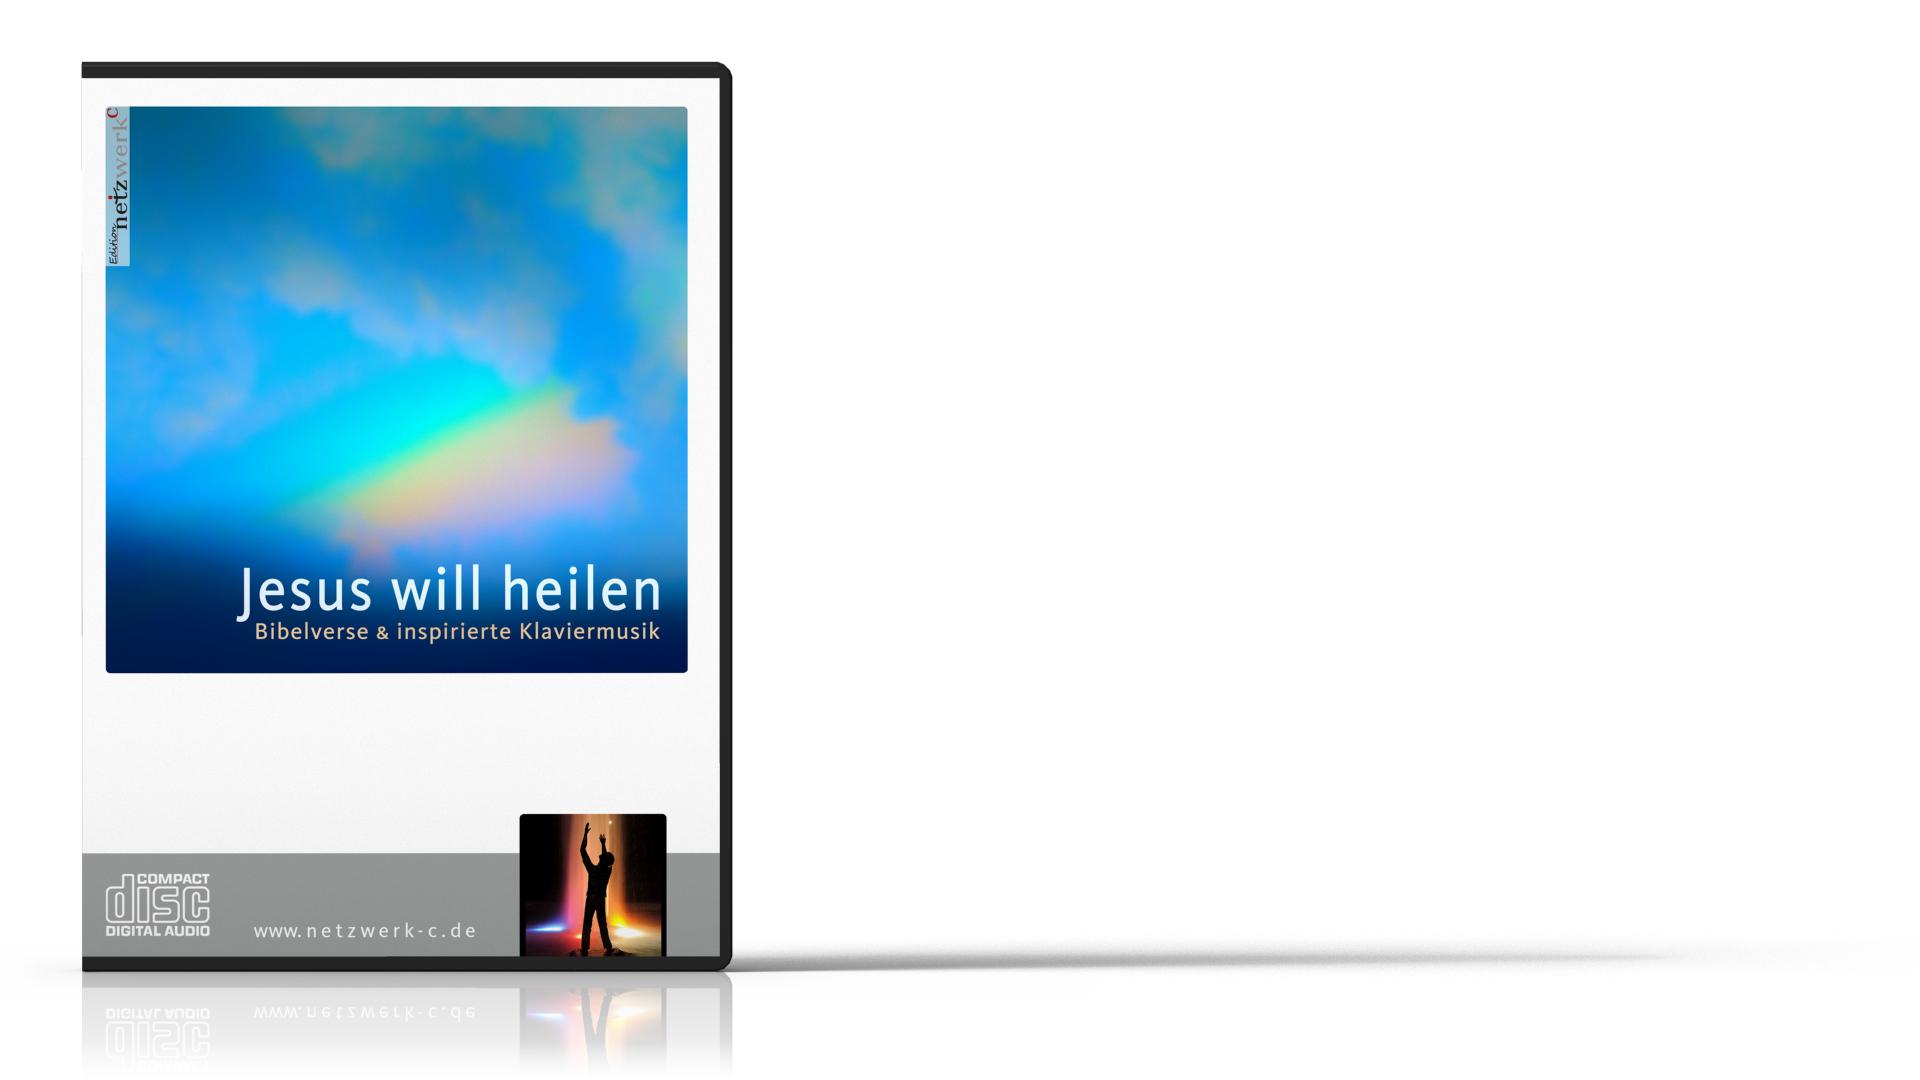 jesus will heilen dvd-box 1920x1080 A